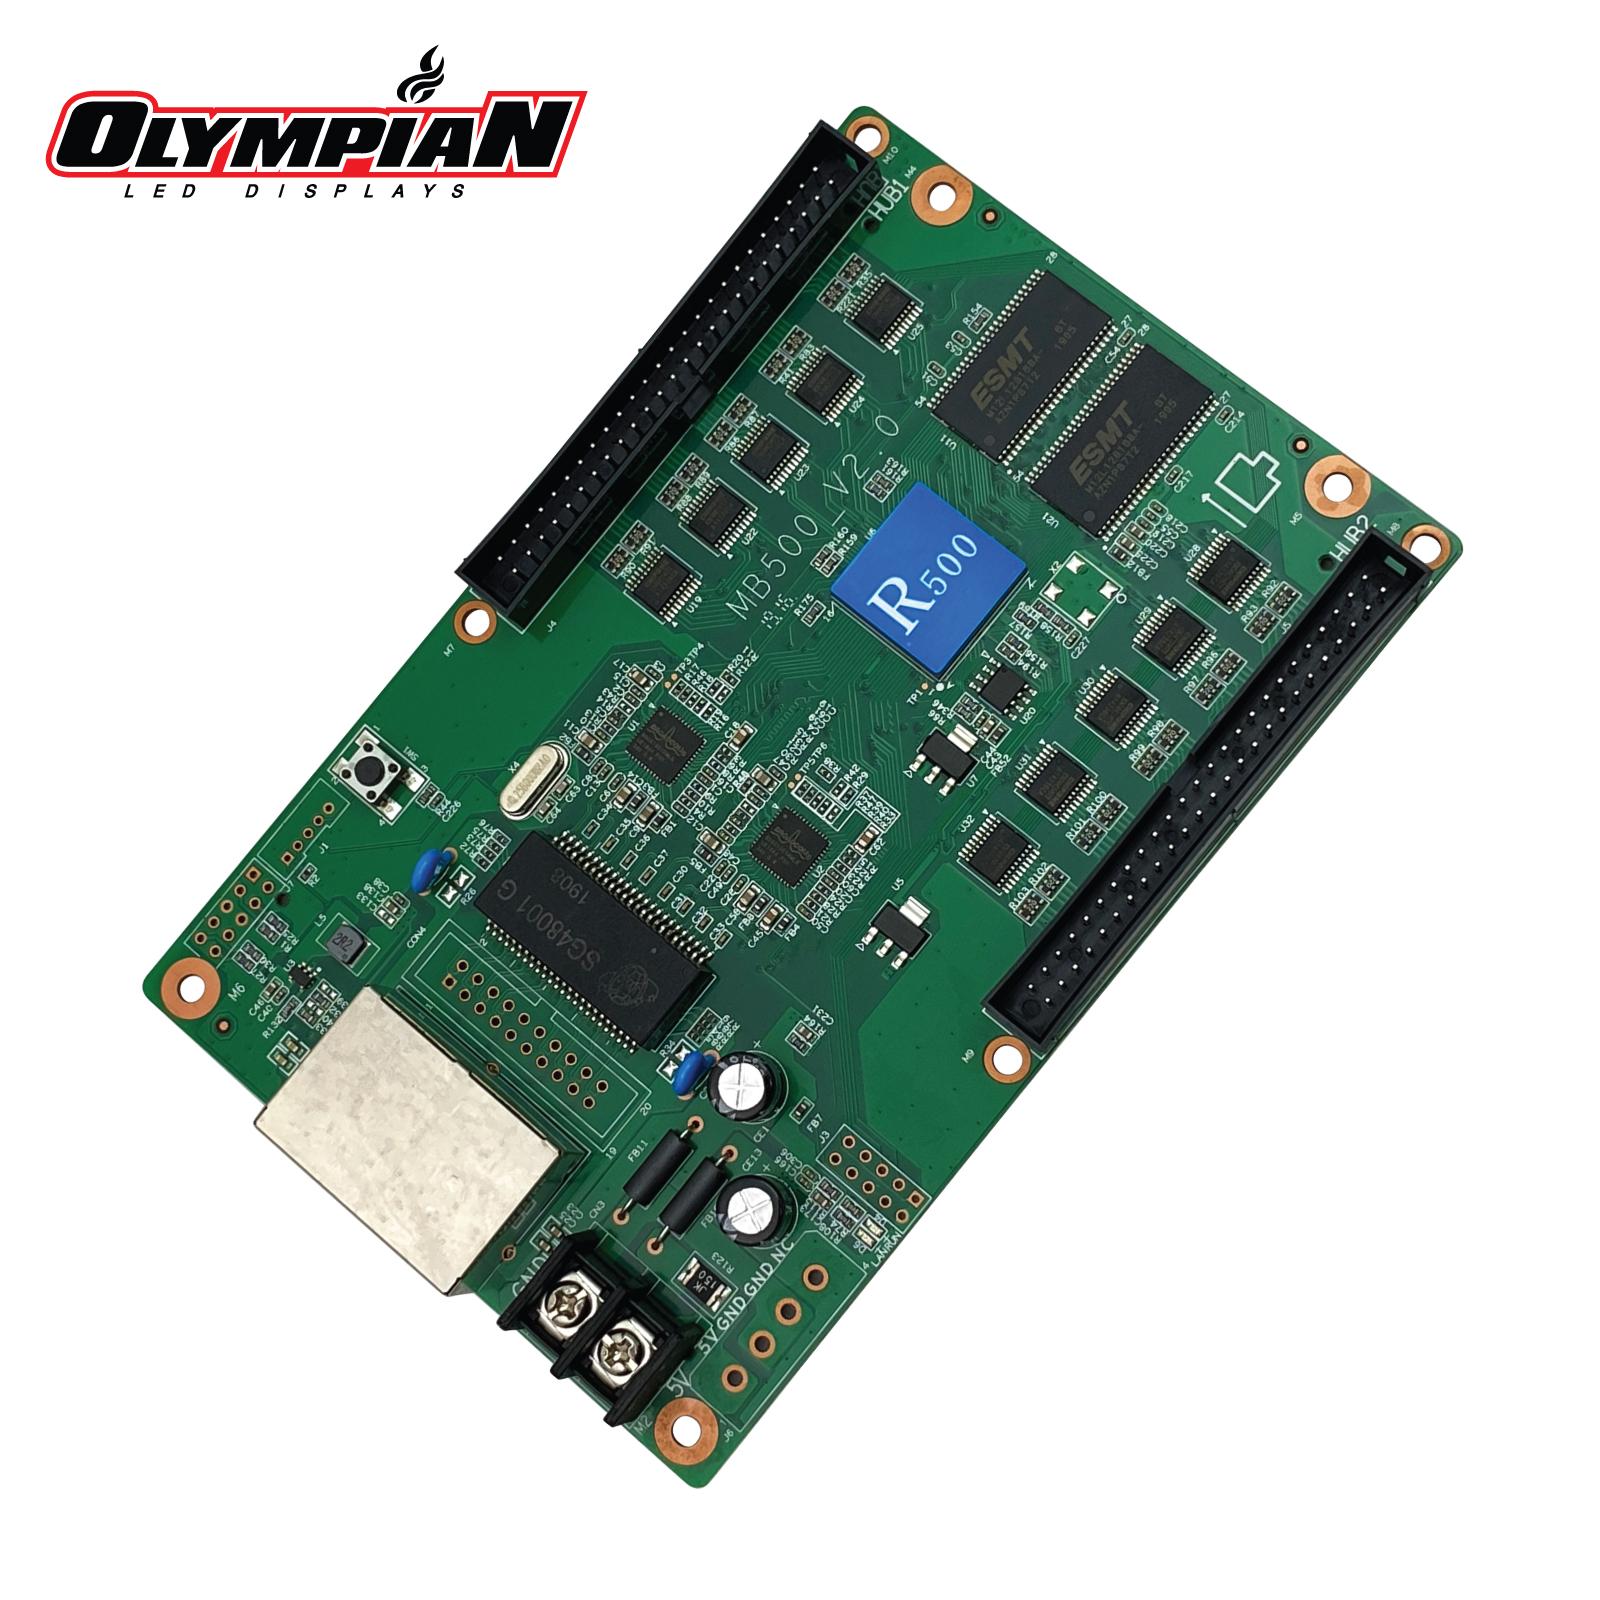 Huidu HD-R500 LED Receiving Card